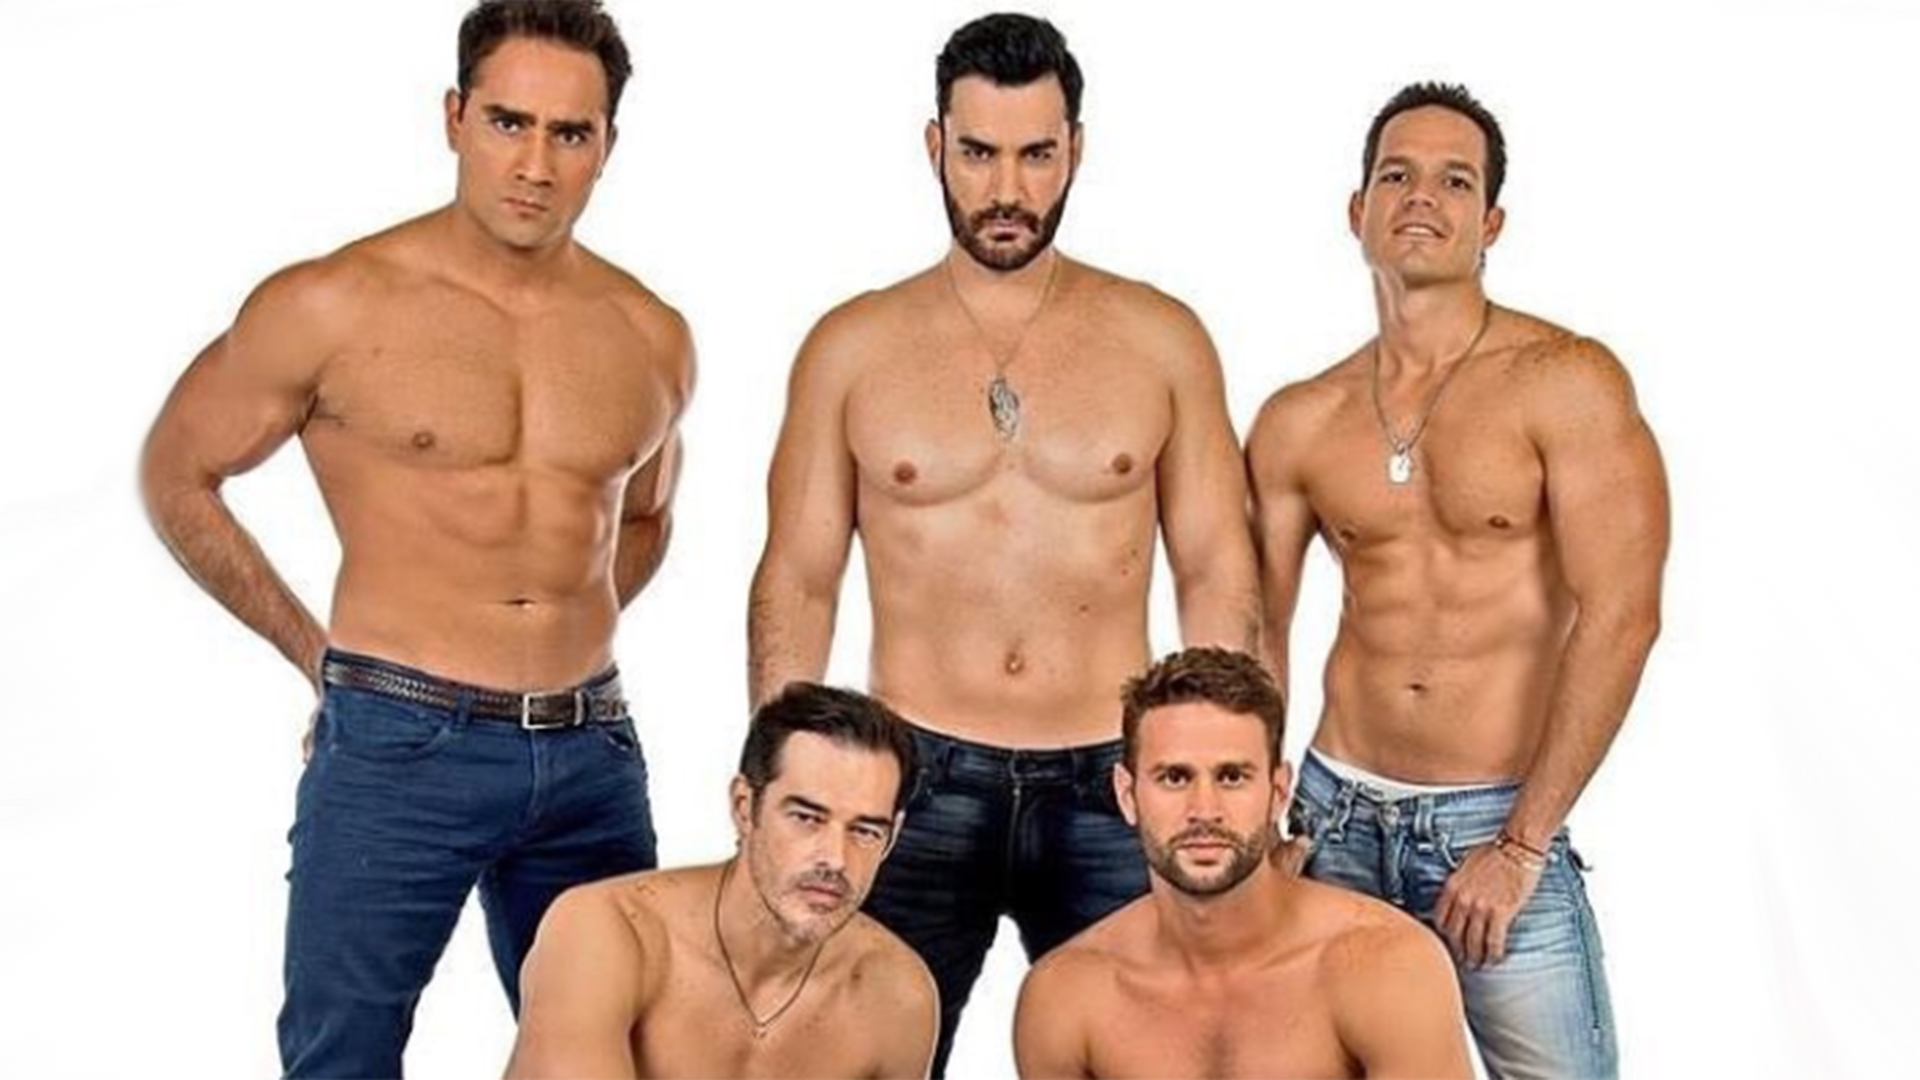 http://www.telemundo.com/sites/nbcutelemundo/files/images/promo/article/2017/07/10/soloparamujeres.png